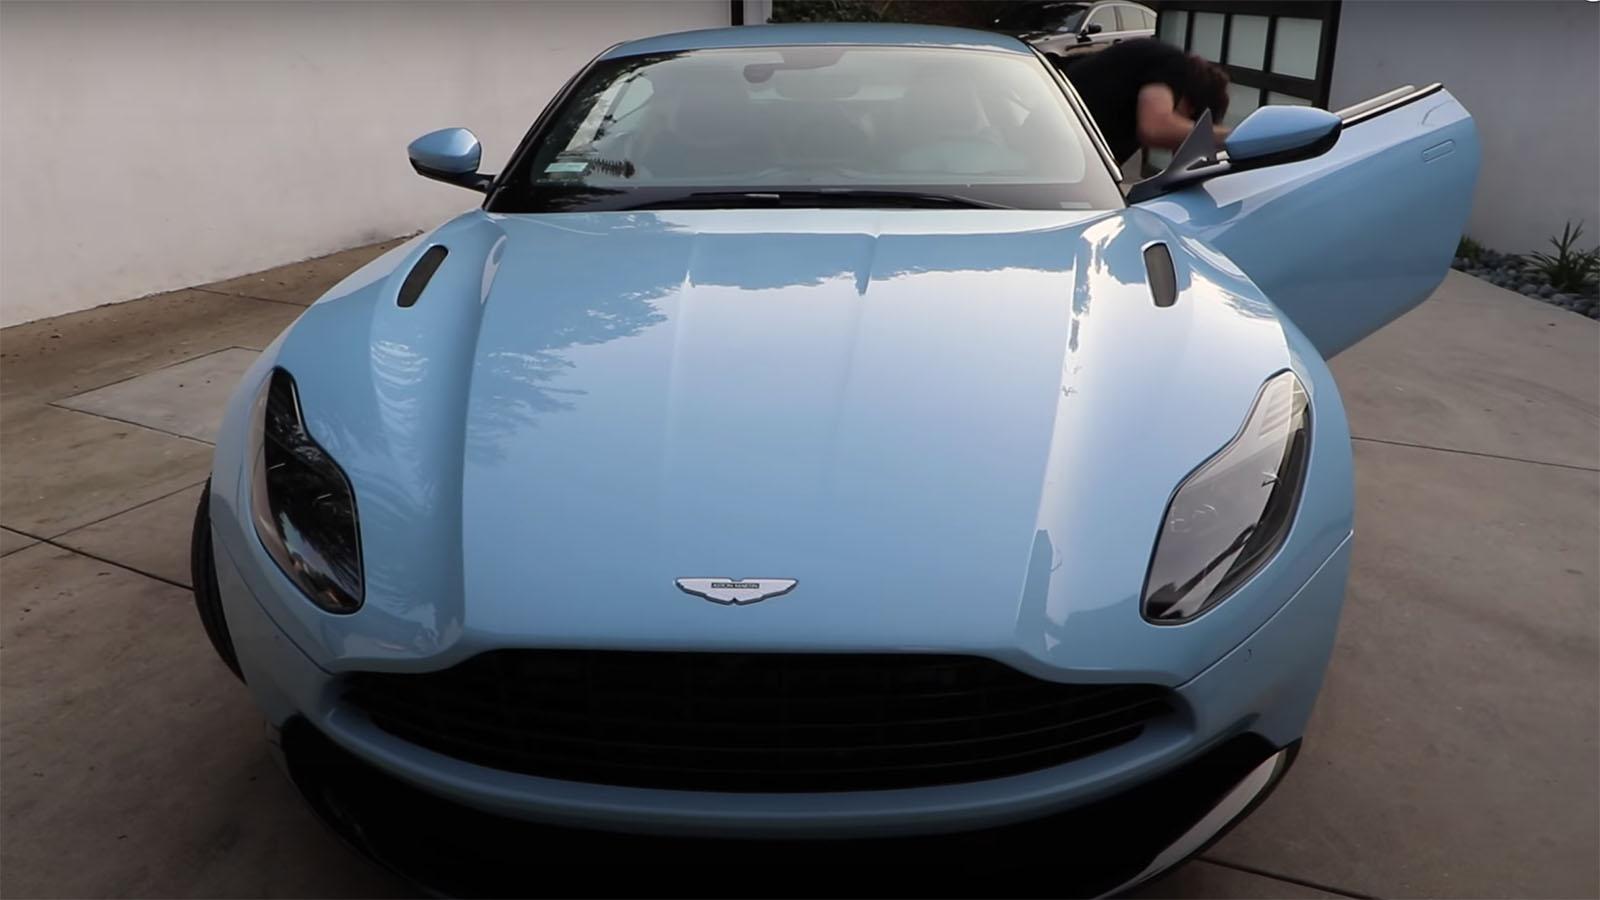 David Dobrik Aston Martin DBS